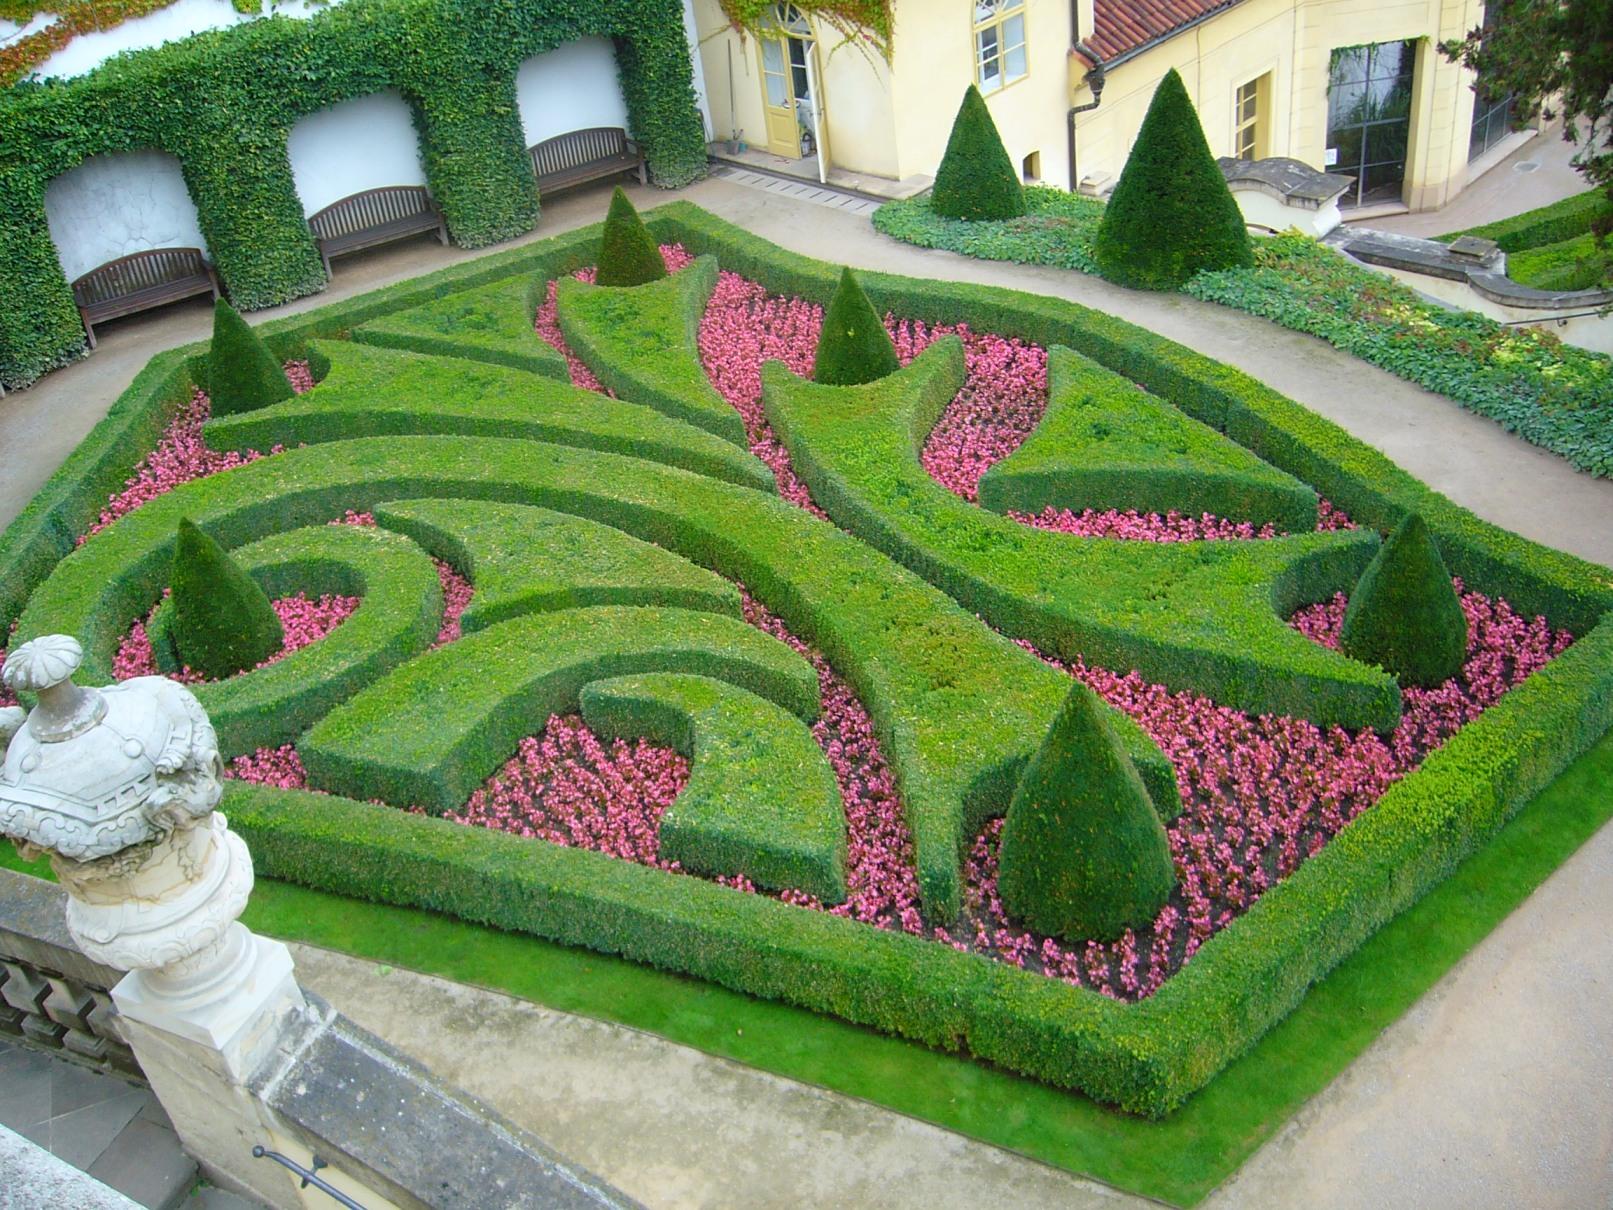 Vrtbovská zahrada - stříhané živé ploty